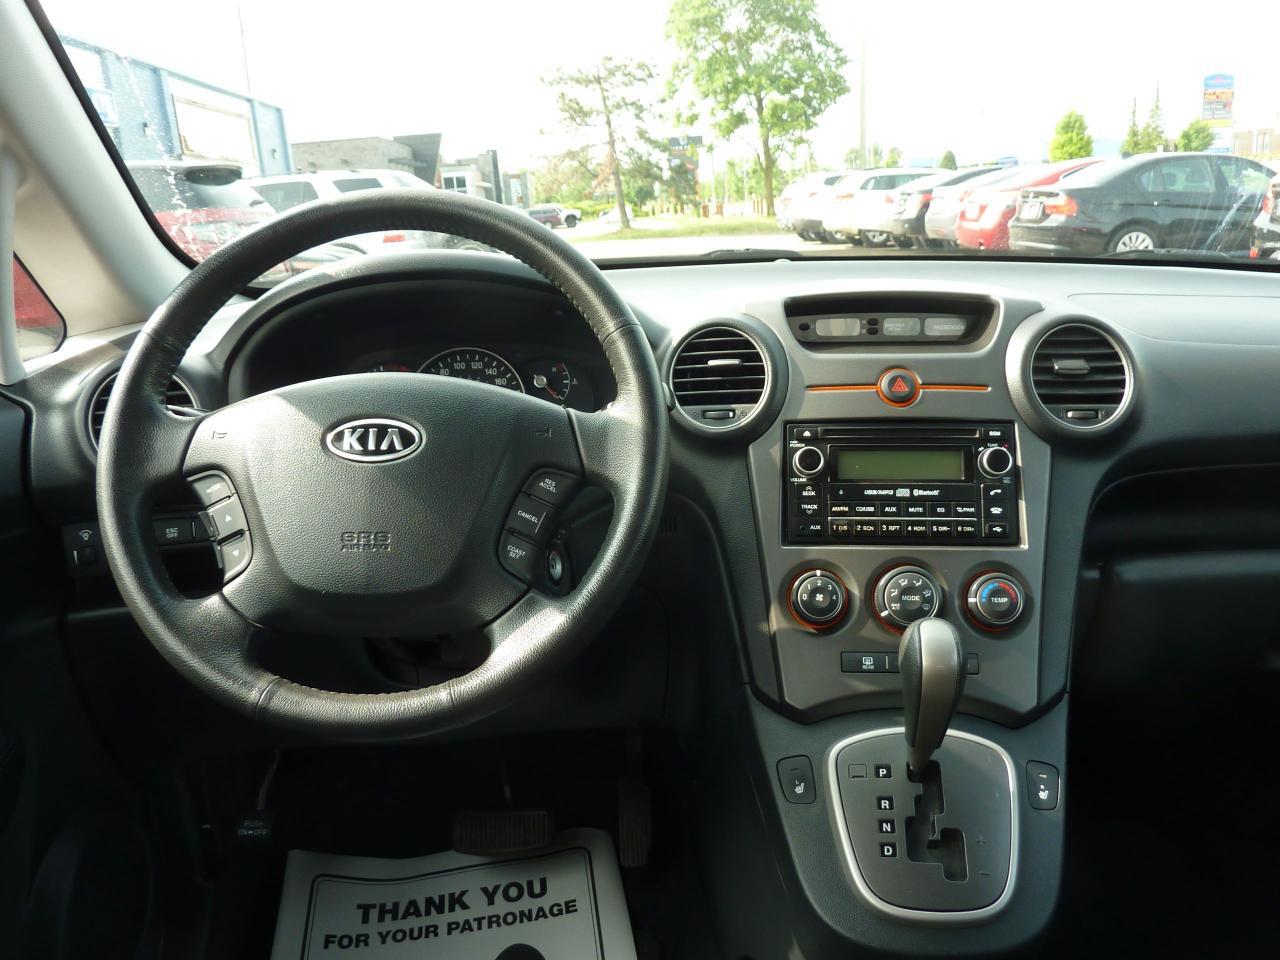 2009 Kia Rondo